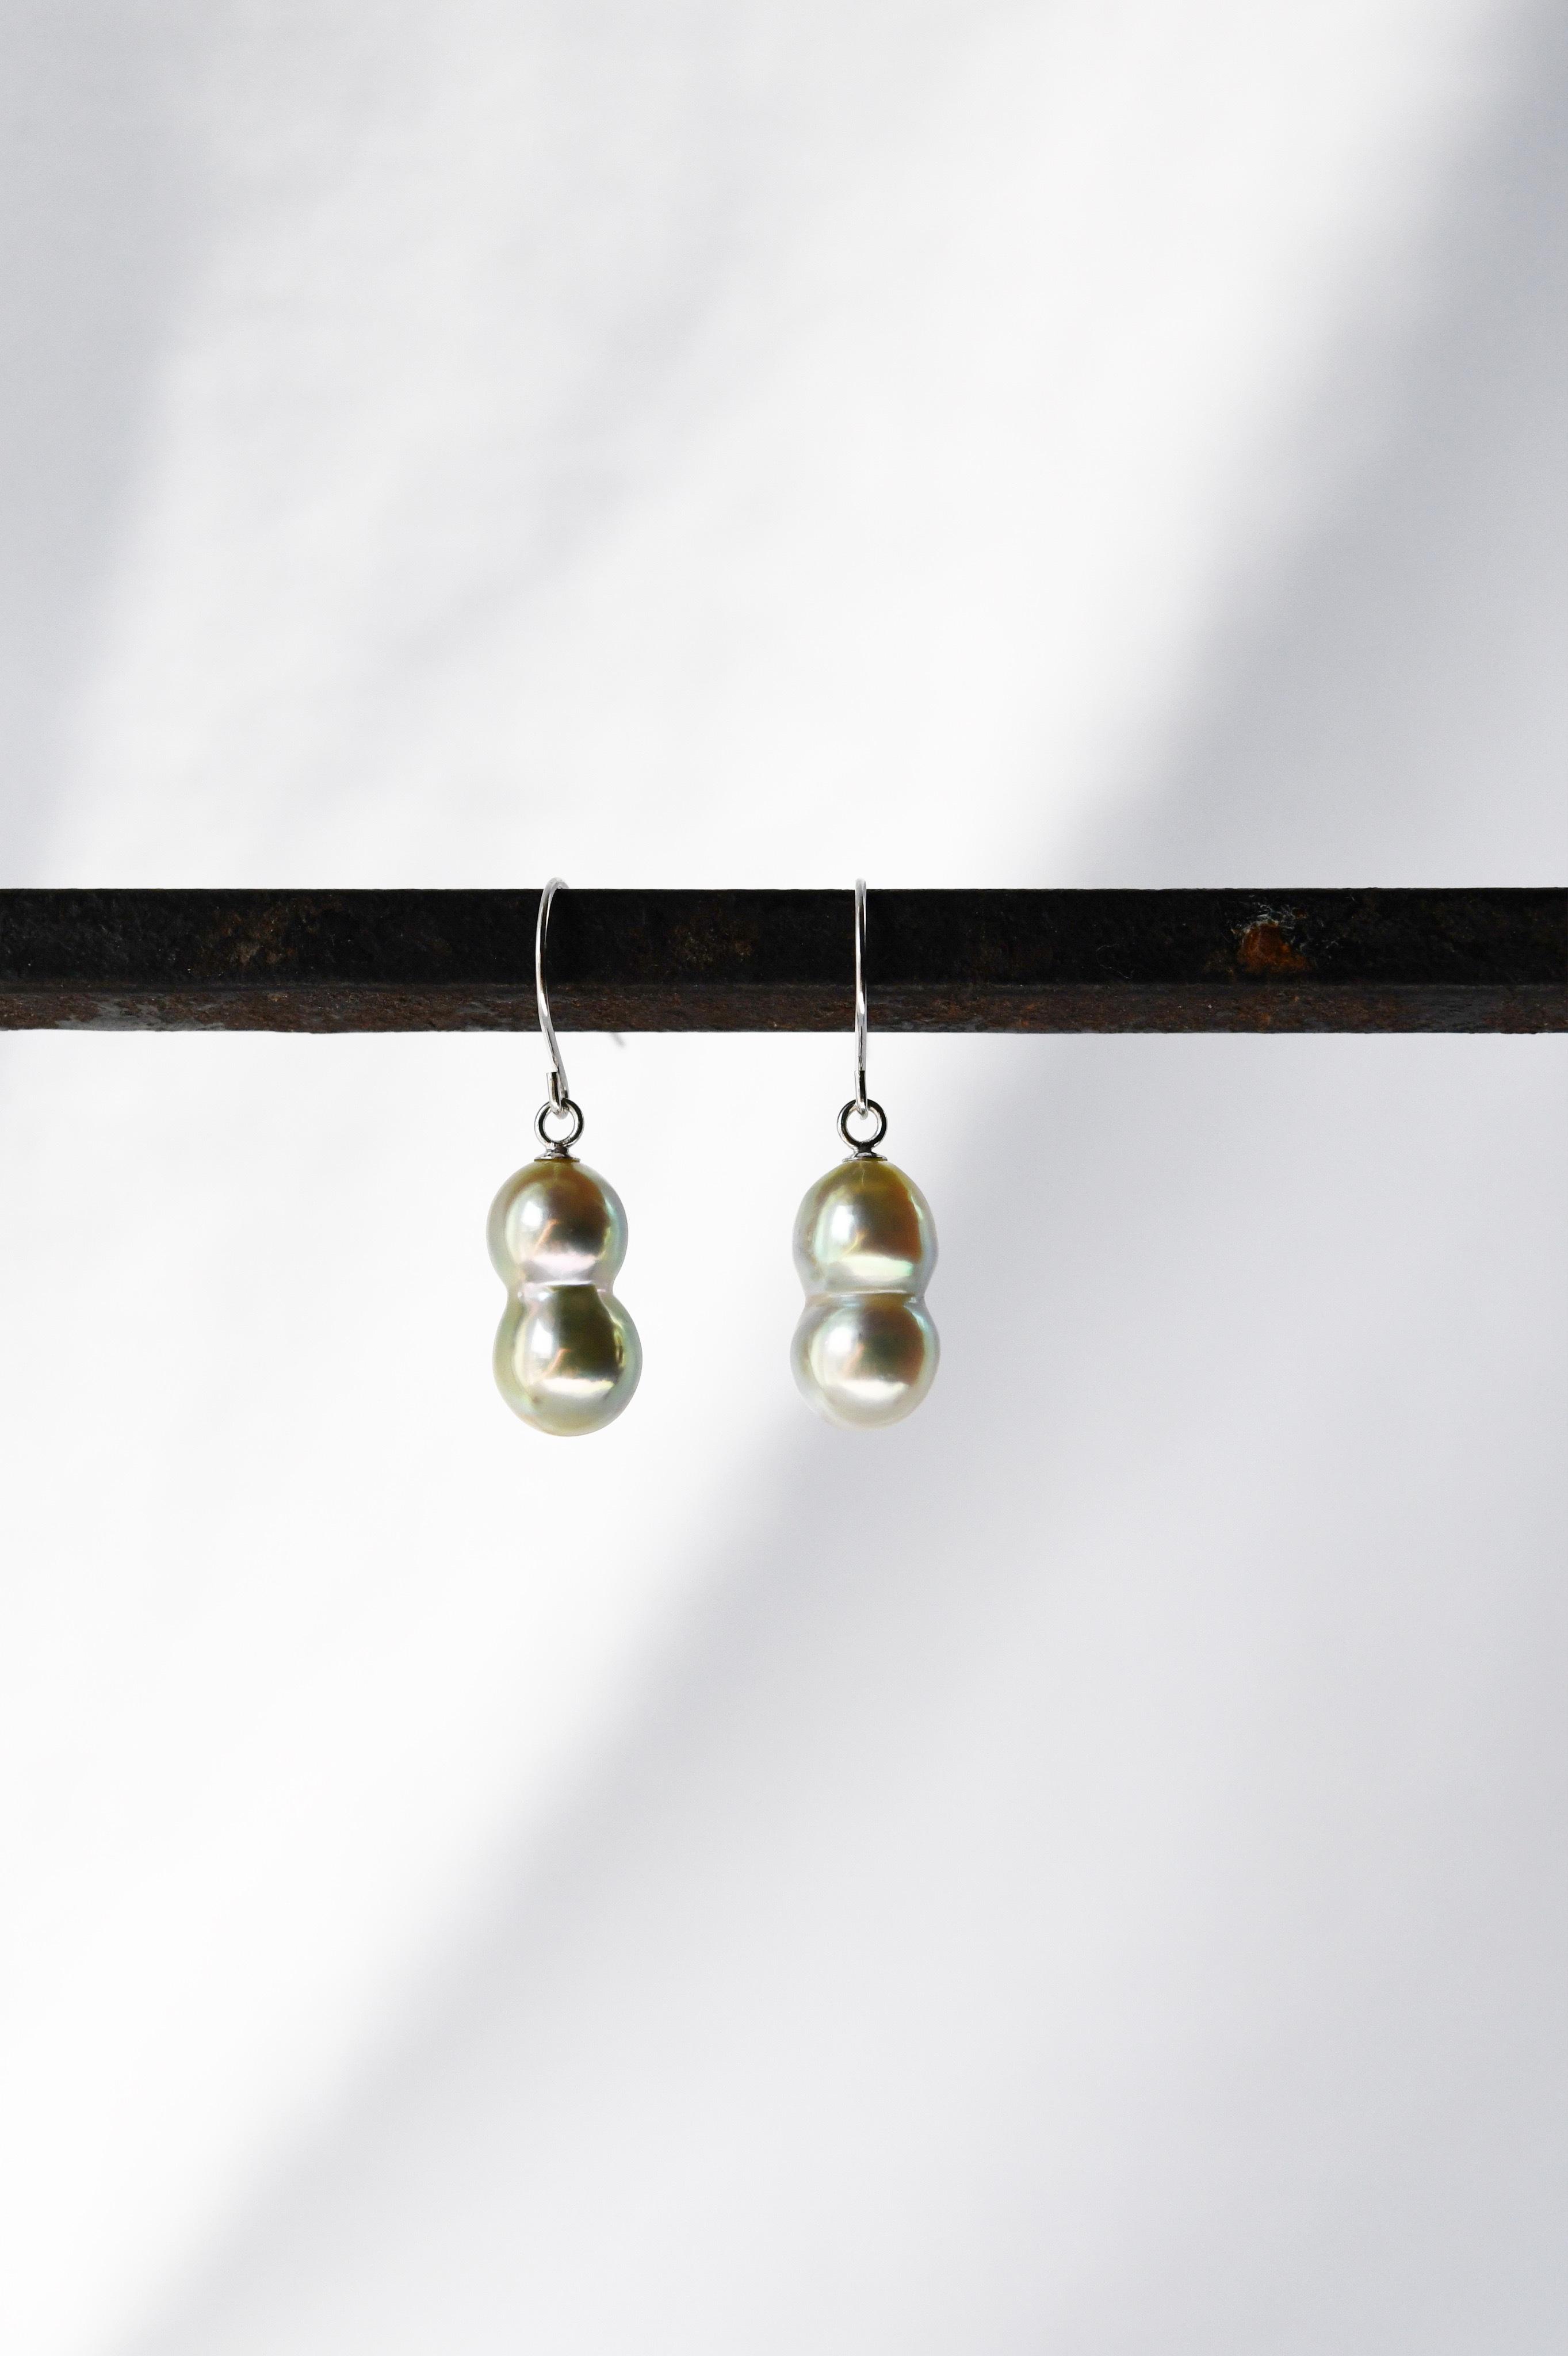 K18WG Akoya Twins Pearl Earrings 18金アコヤ双子真珠ピアス